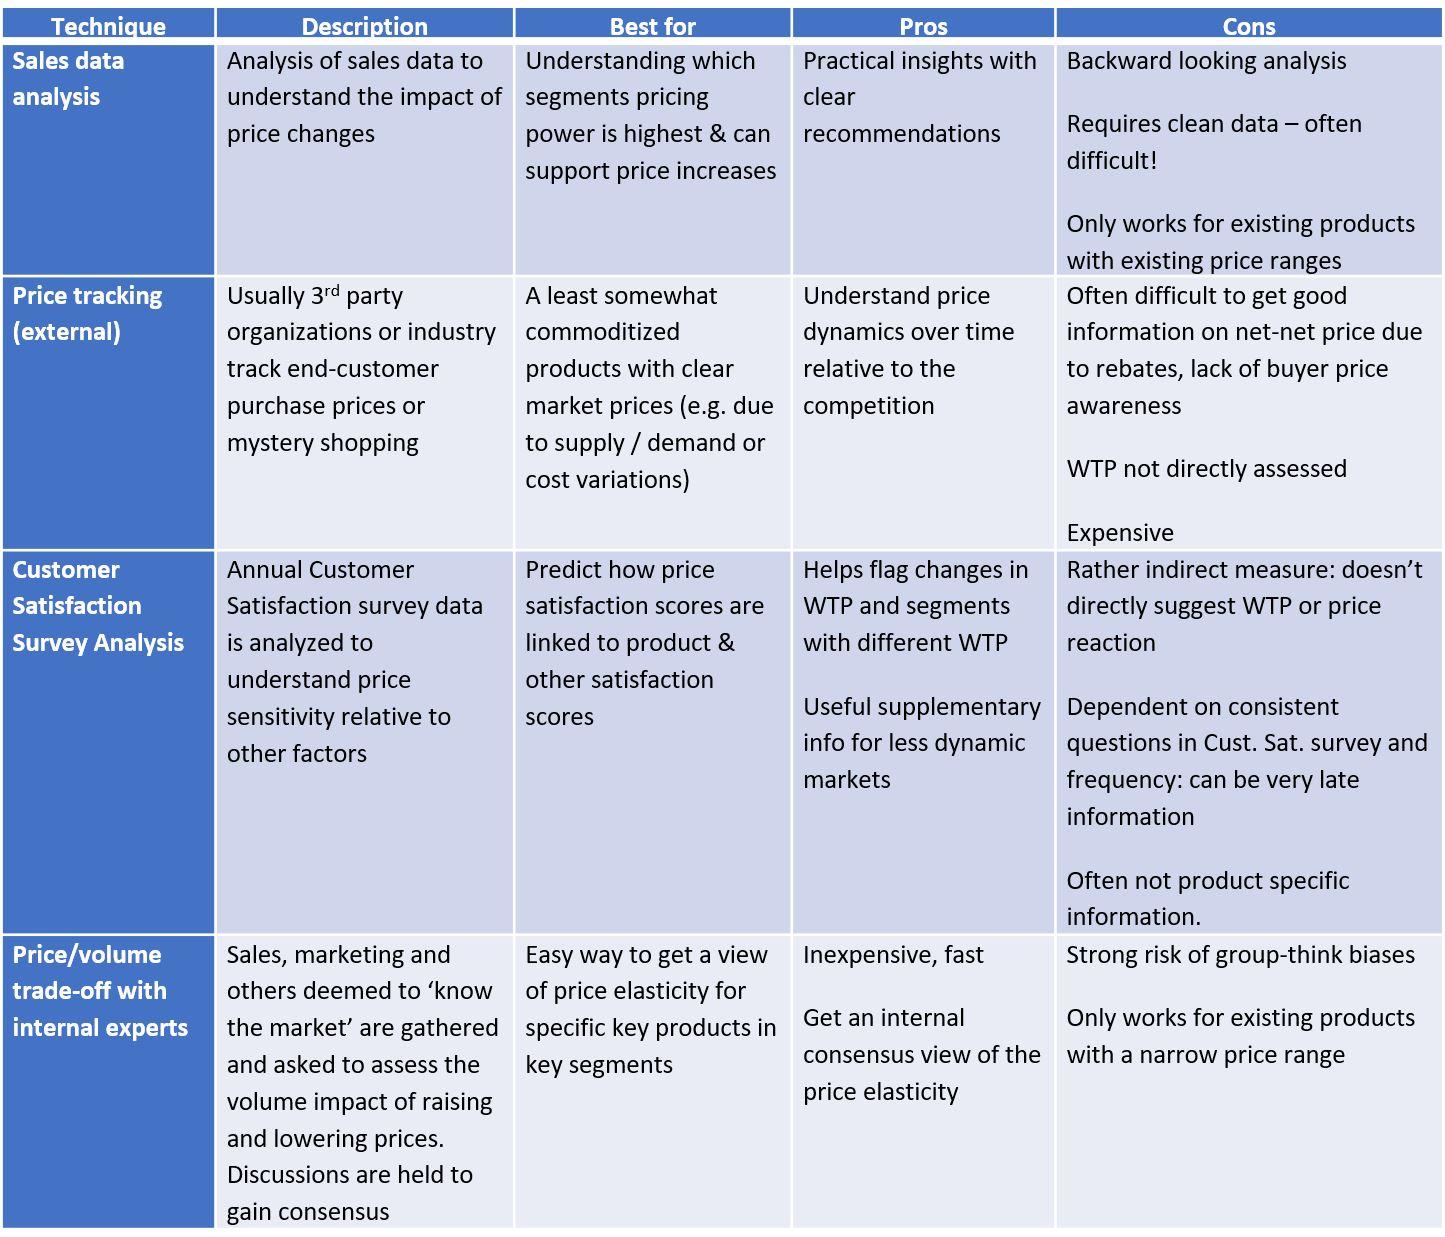 Table 4: Historical price analysis